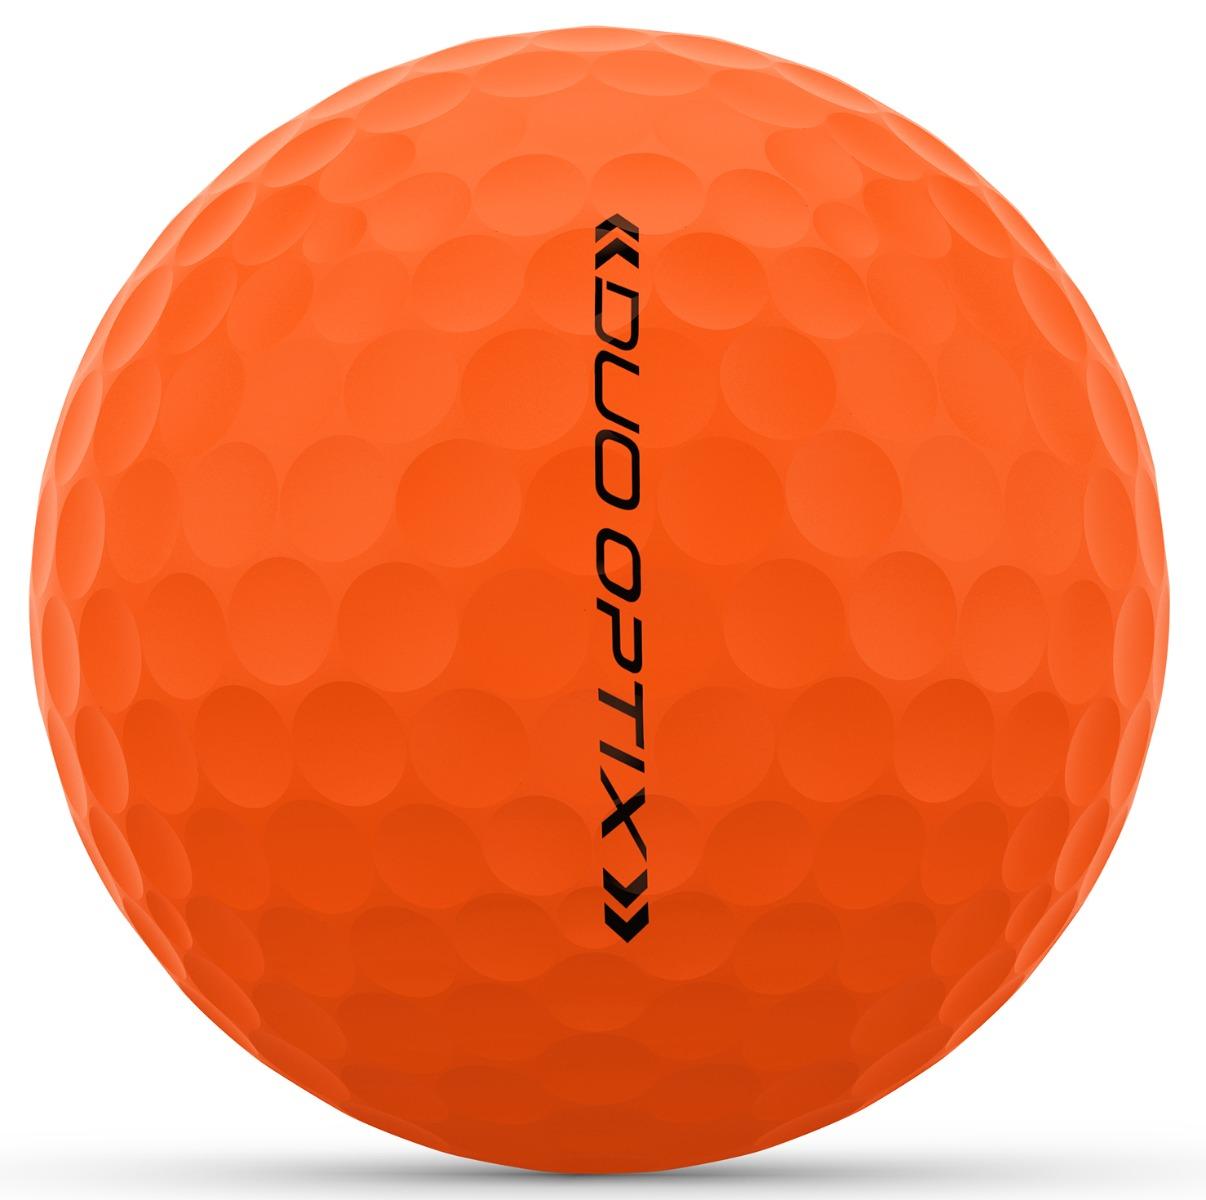 https://www.best4sportsballs.com/pub/media/catalog/product/d/u/duo_optix_orange_ball_600.jpg